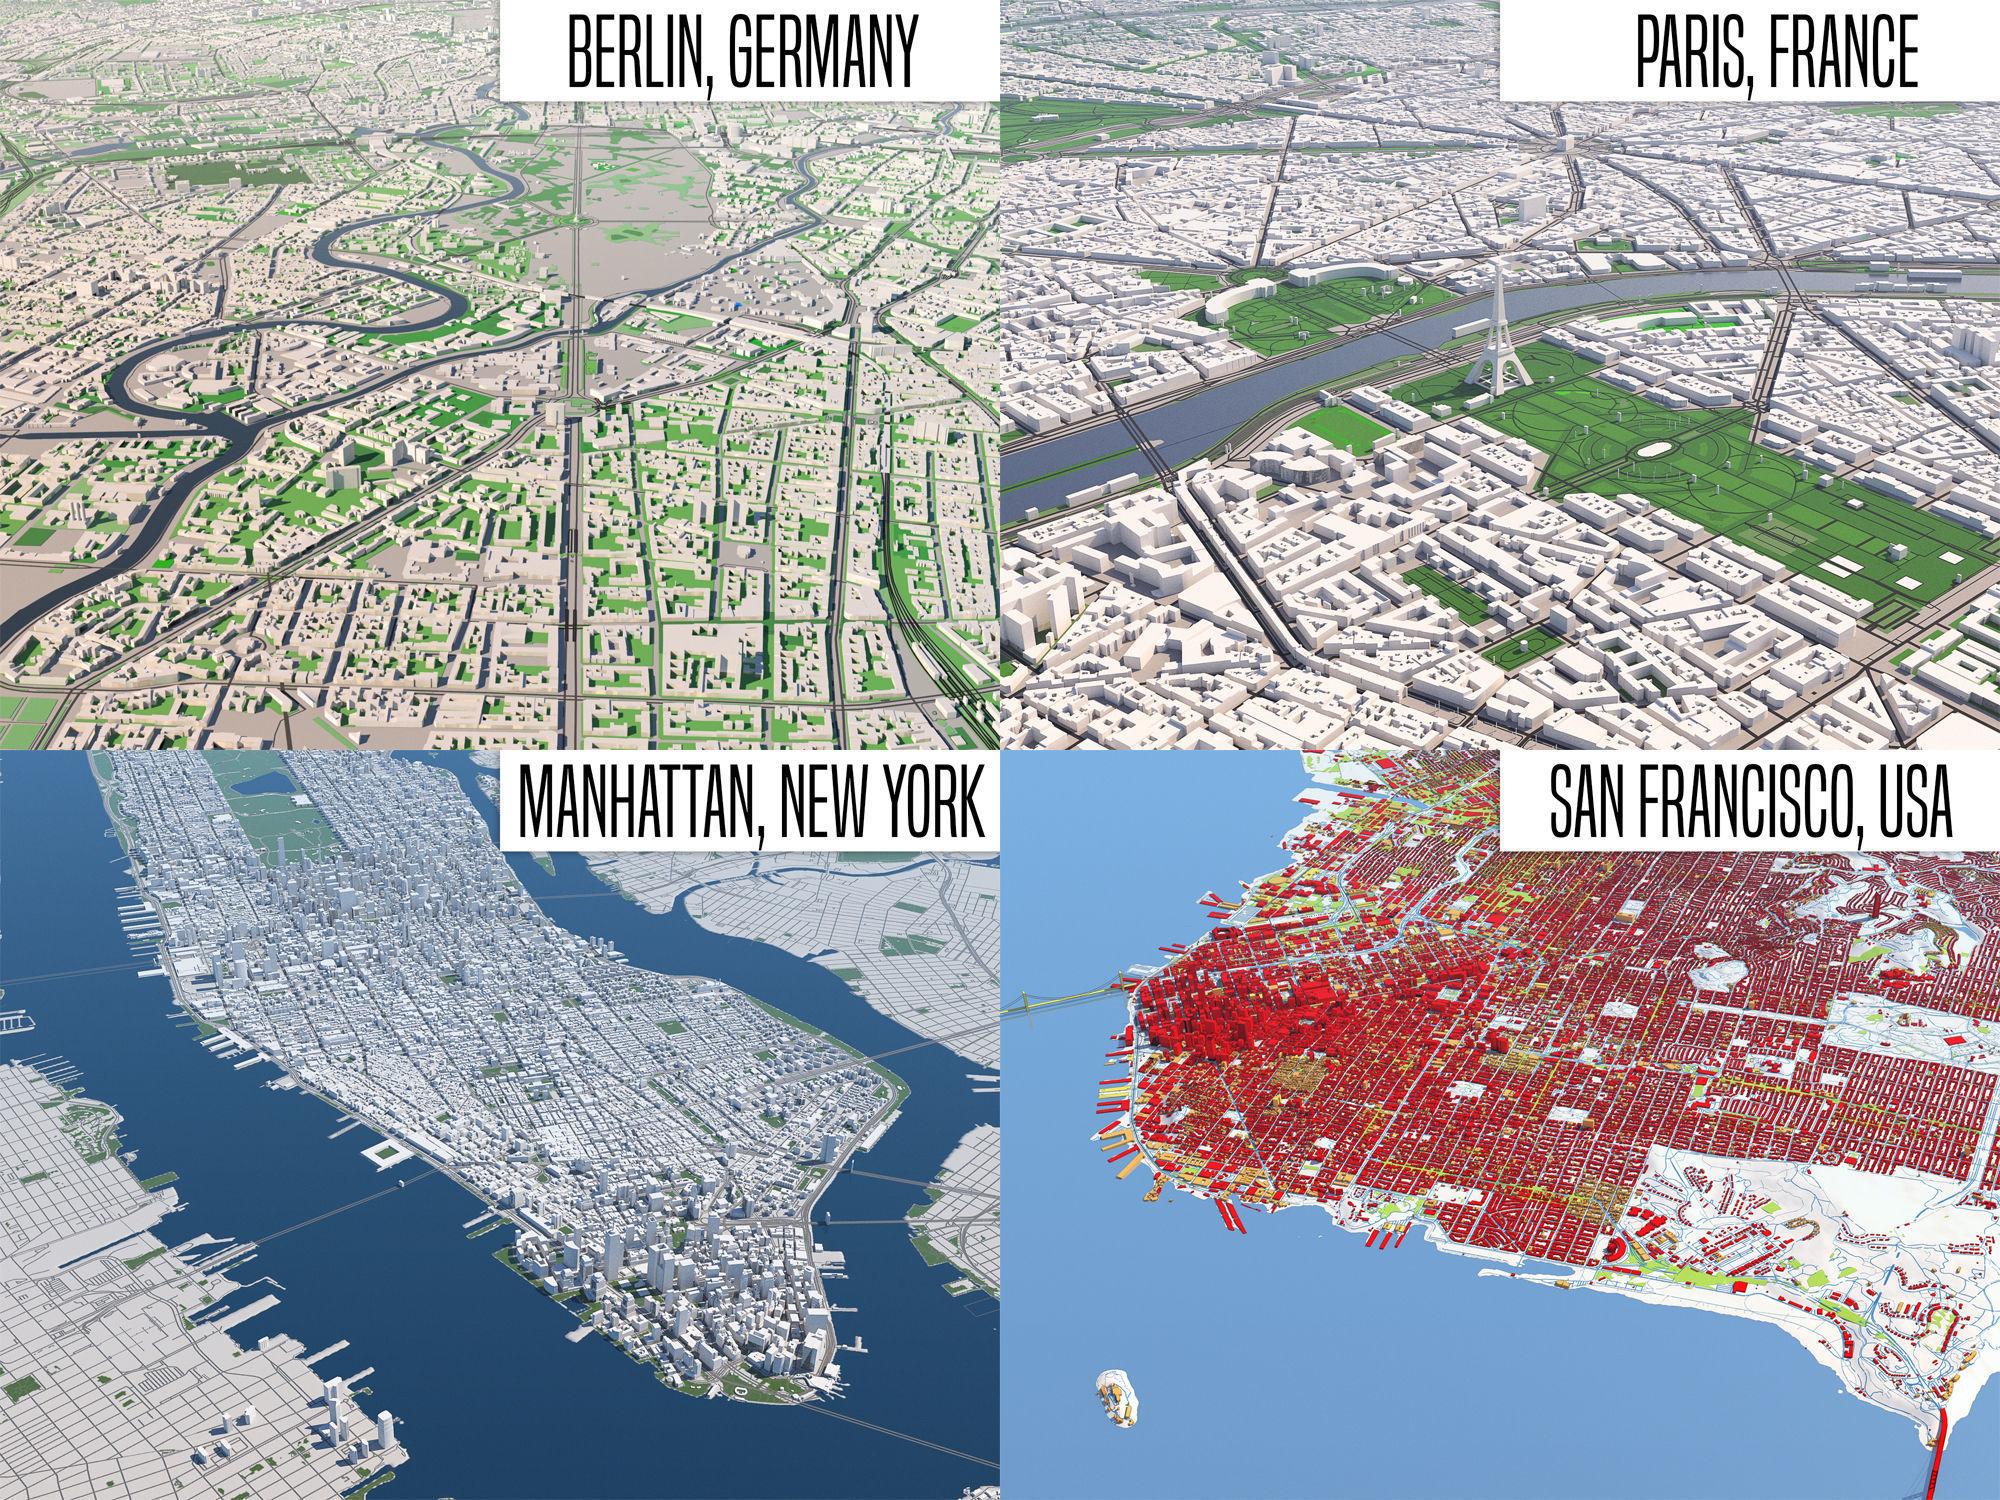 Berlin - Paris - NewYork - SanFrancisco